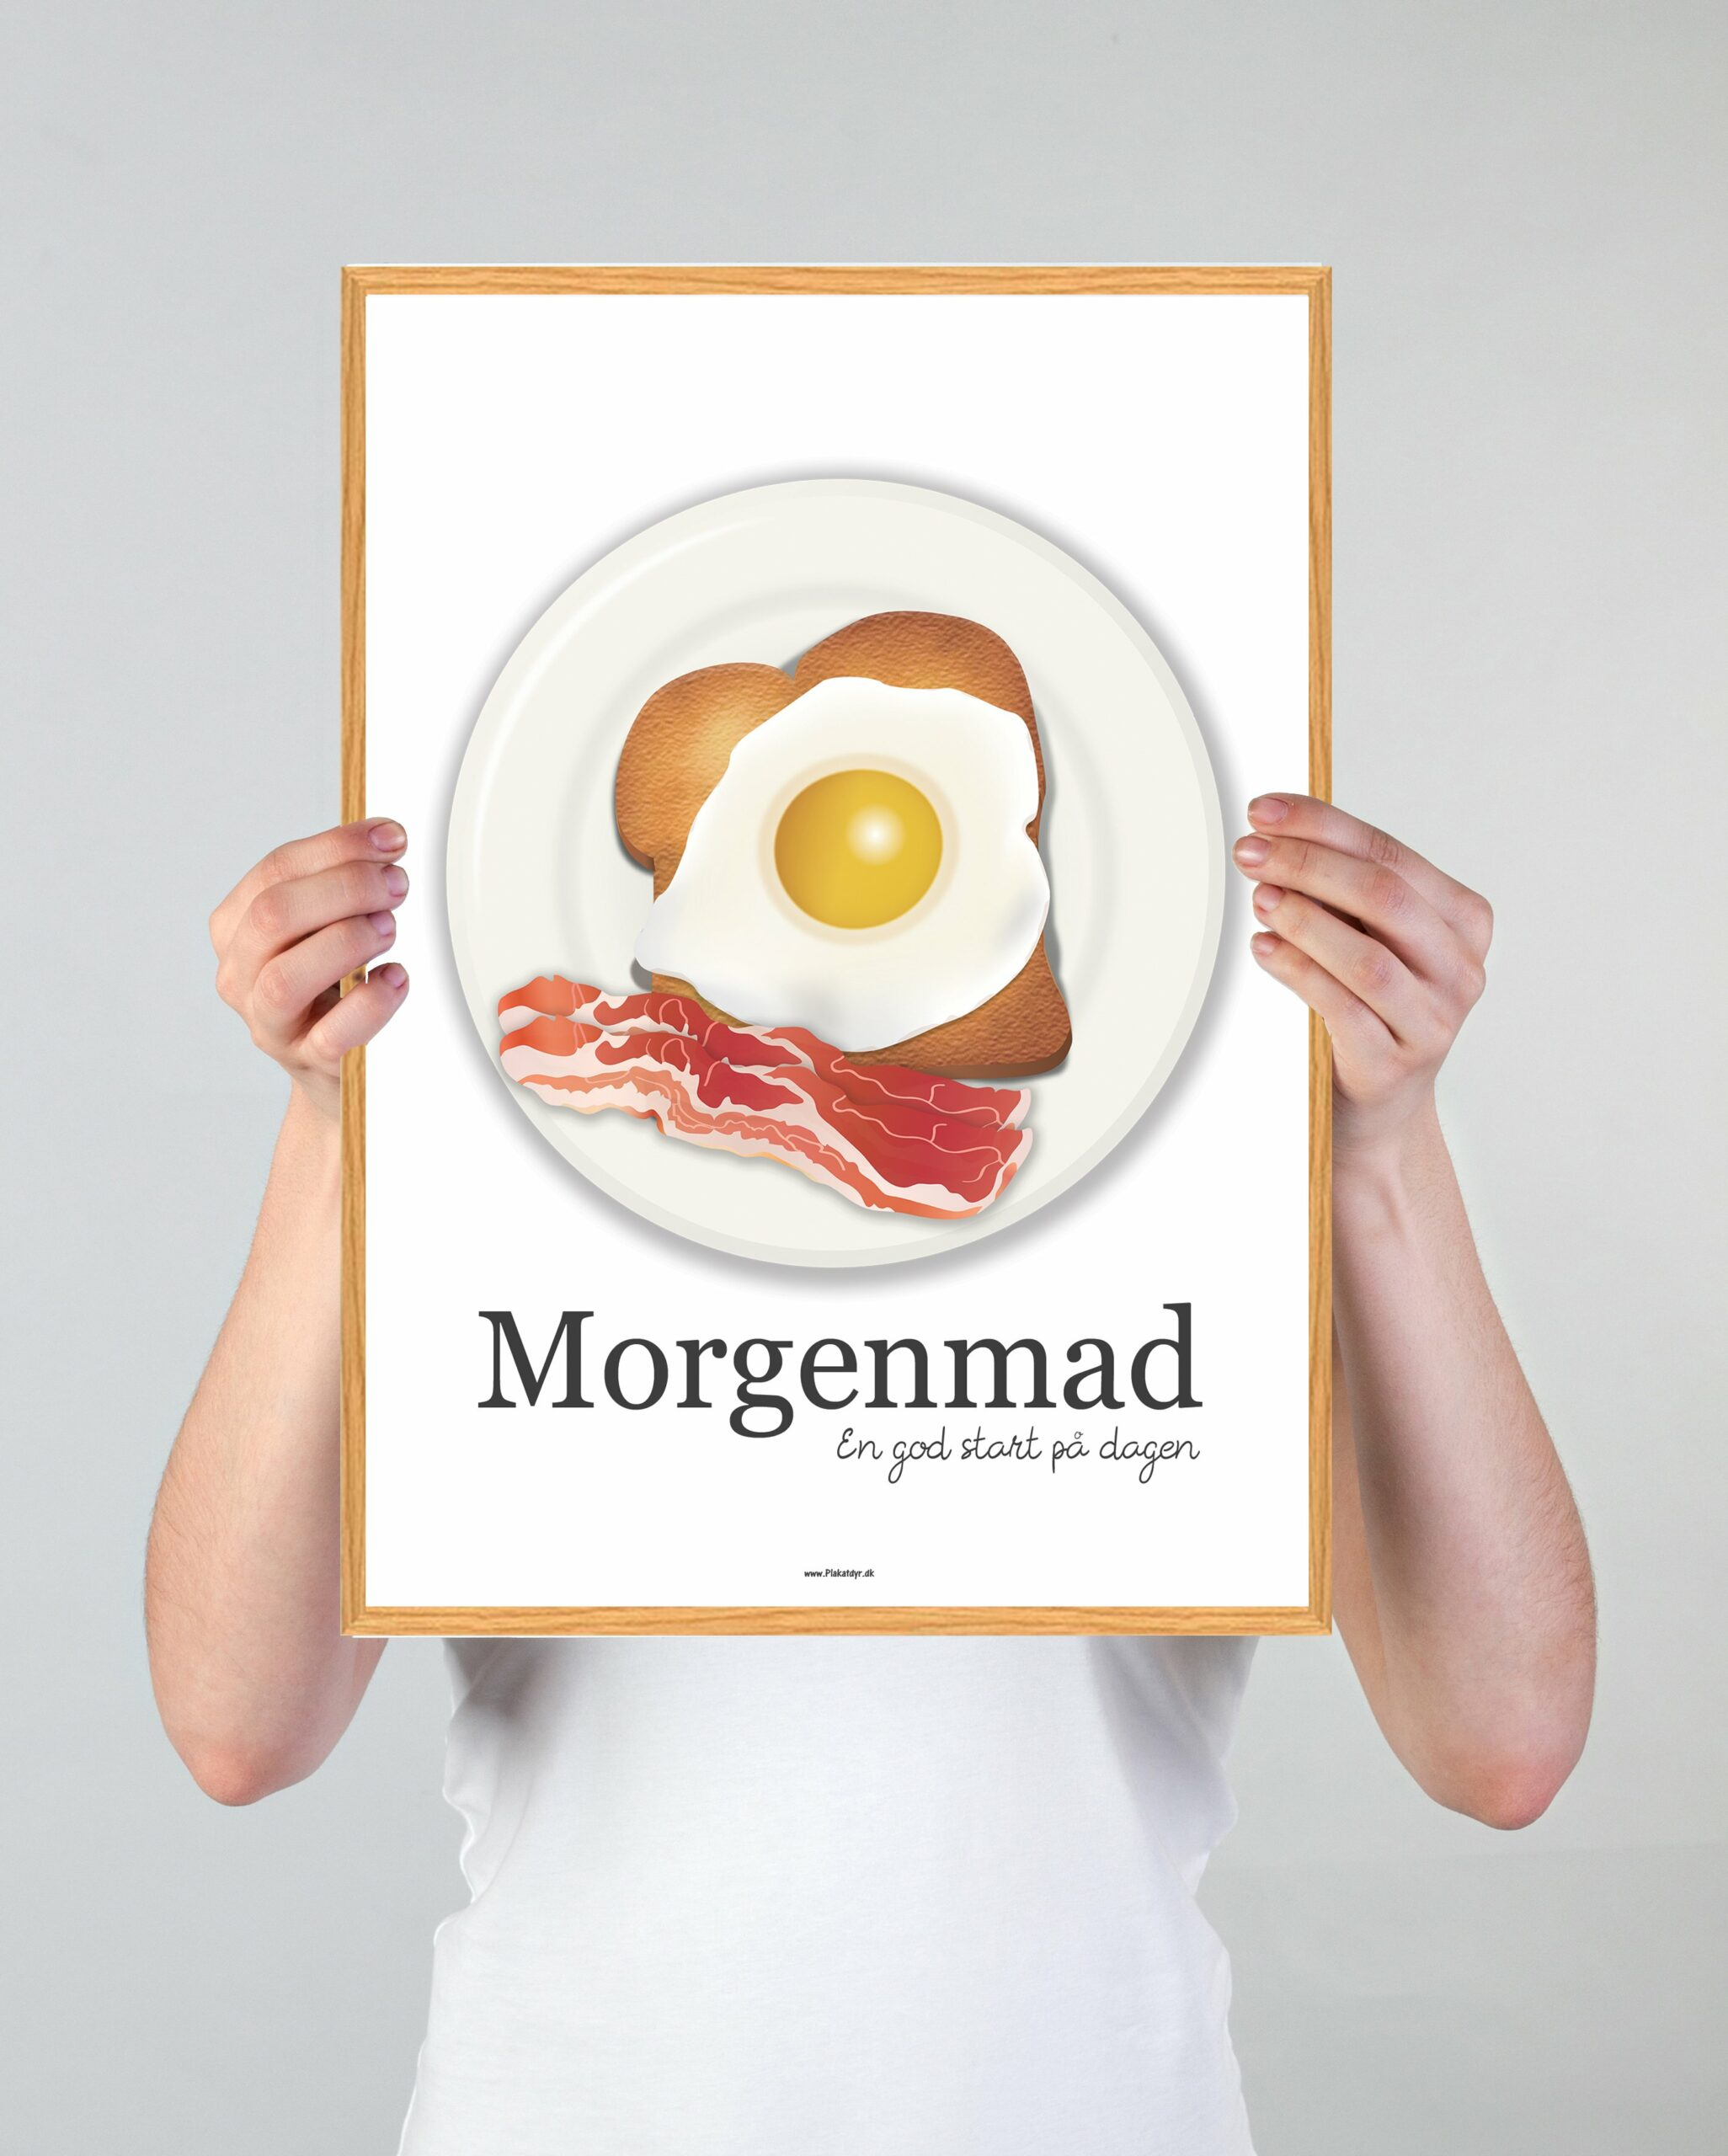 morgenmad-aeg-bacon